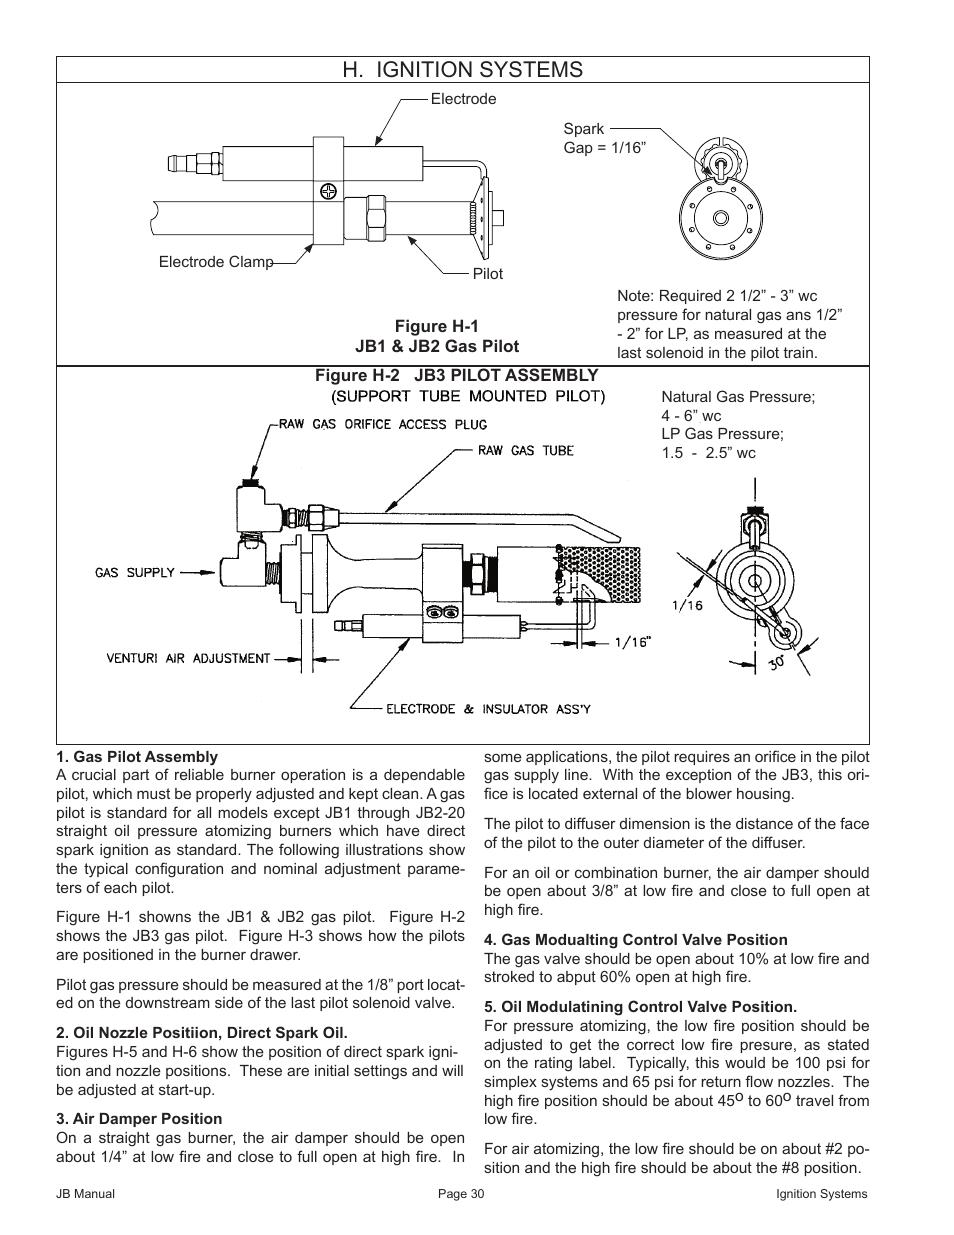 H. ignition systems | Fulton VMP Webster Oil_Combo Burner User Manual |  Page 30 / 52